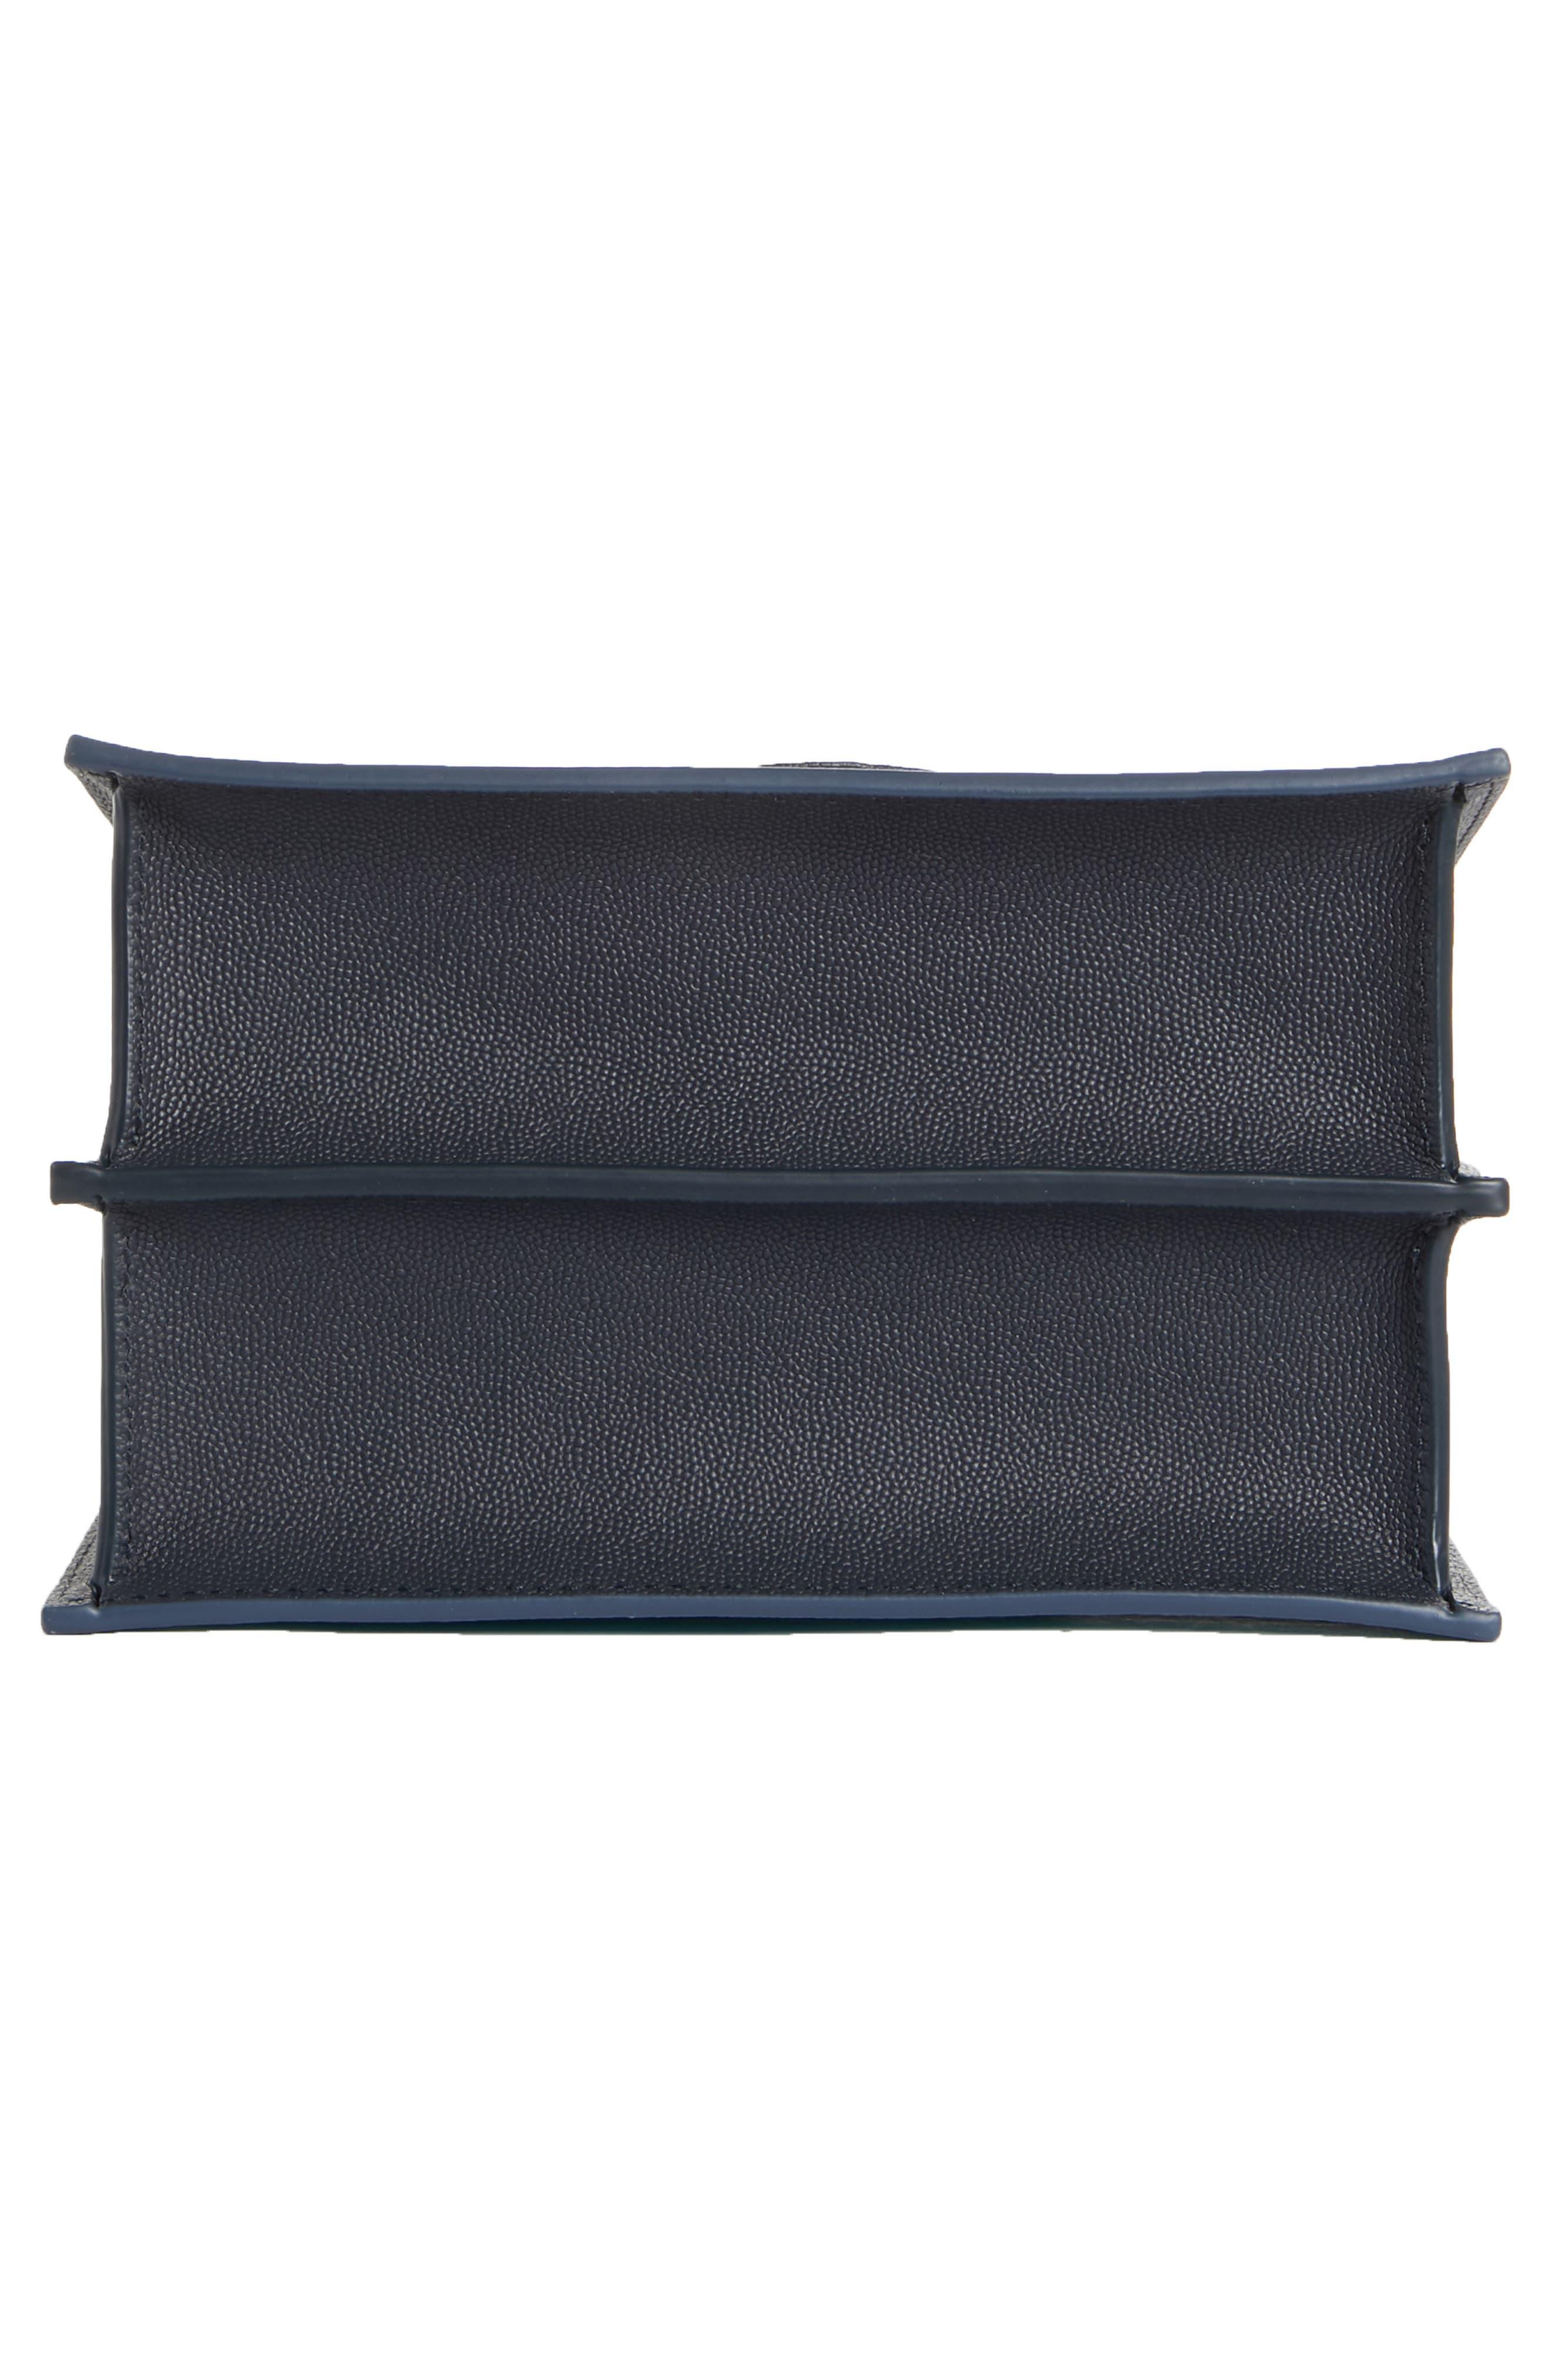 Mini Phoebe Leather Bag,                             Alternate thumbnail 6, color,                             TURQUOISE